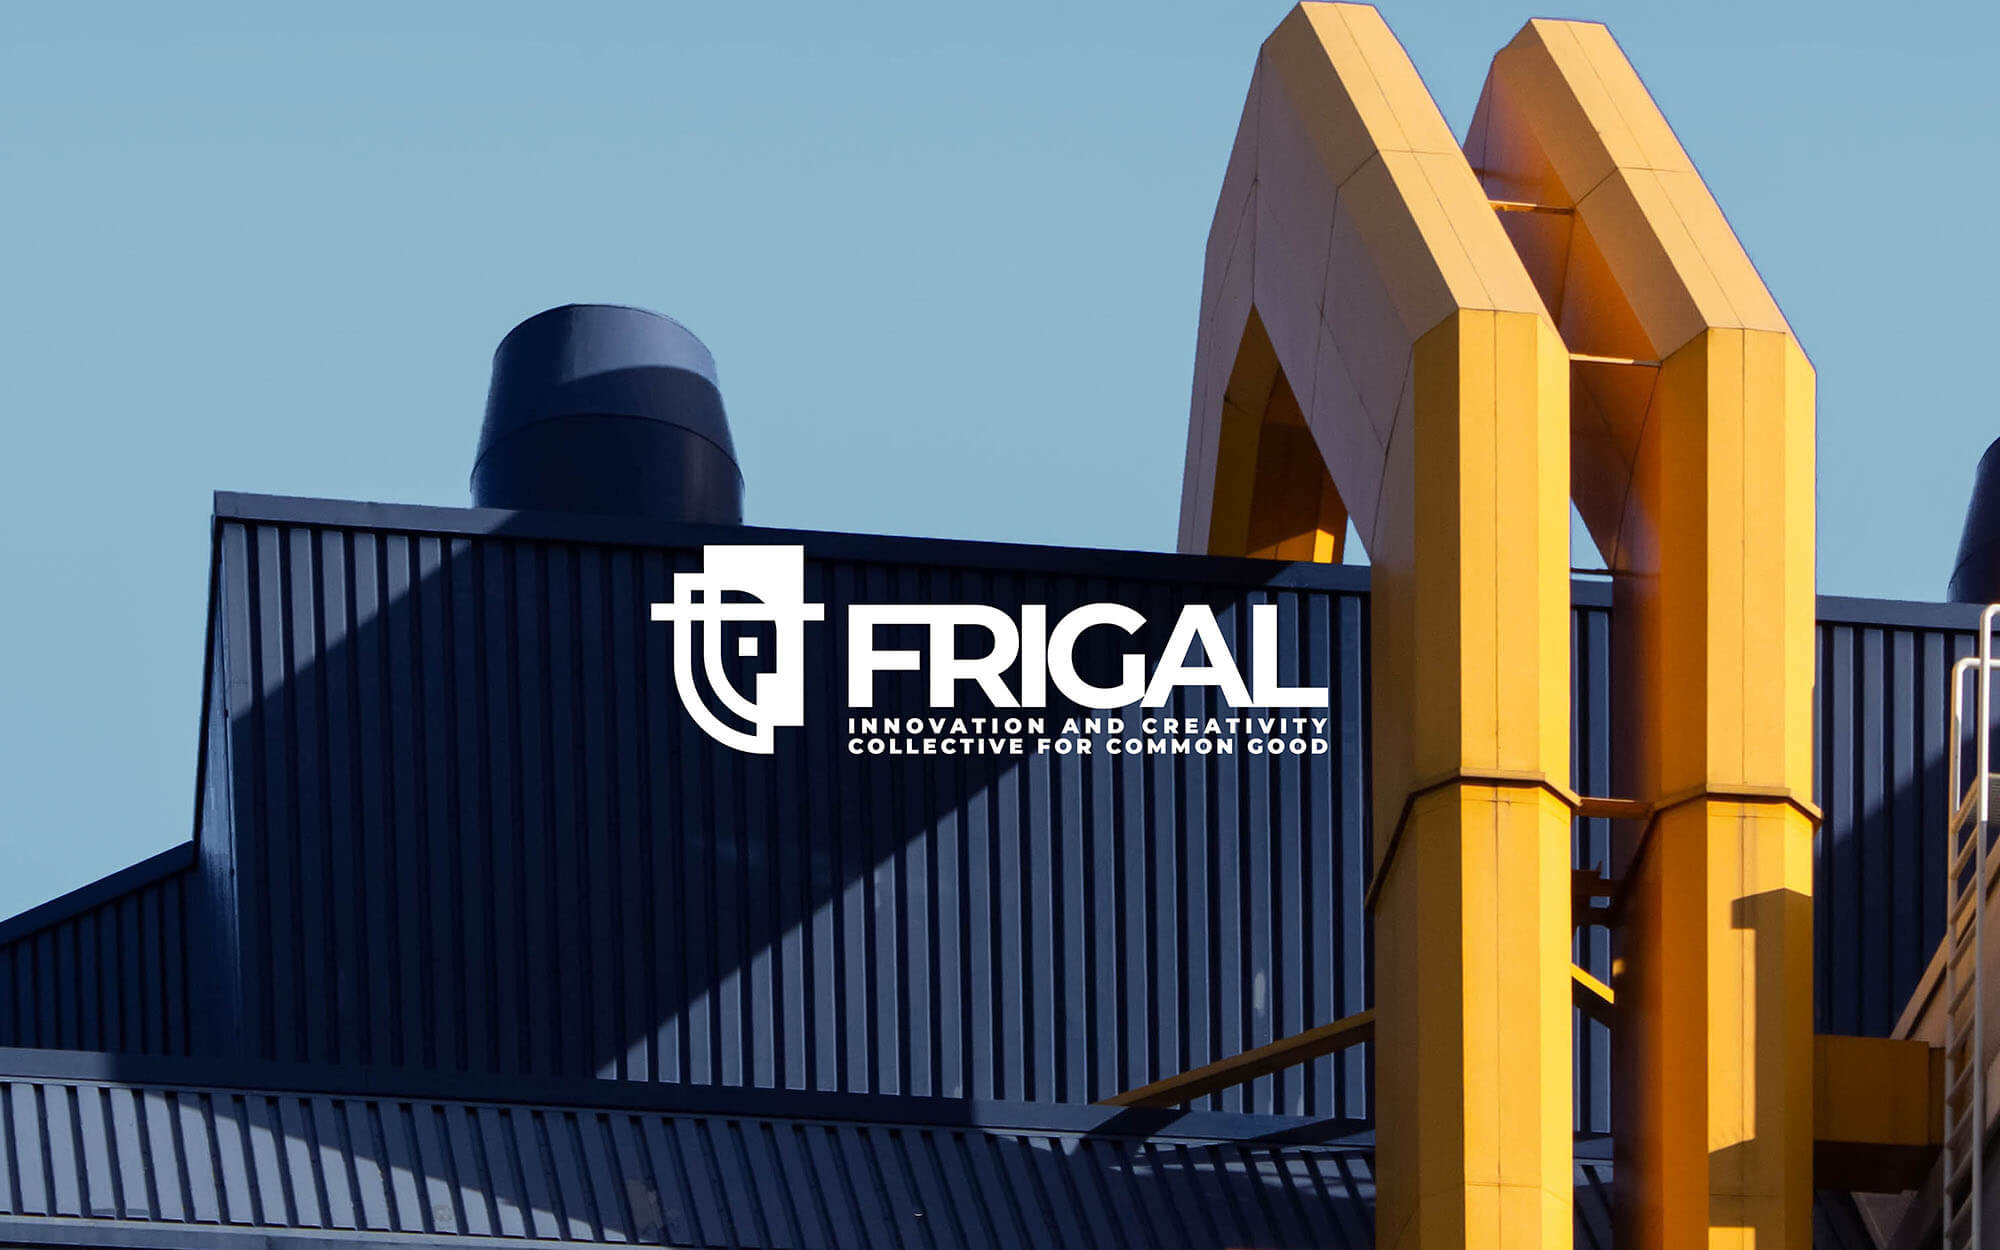 brand-new-day-frigal-logo